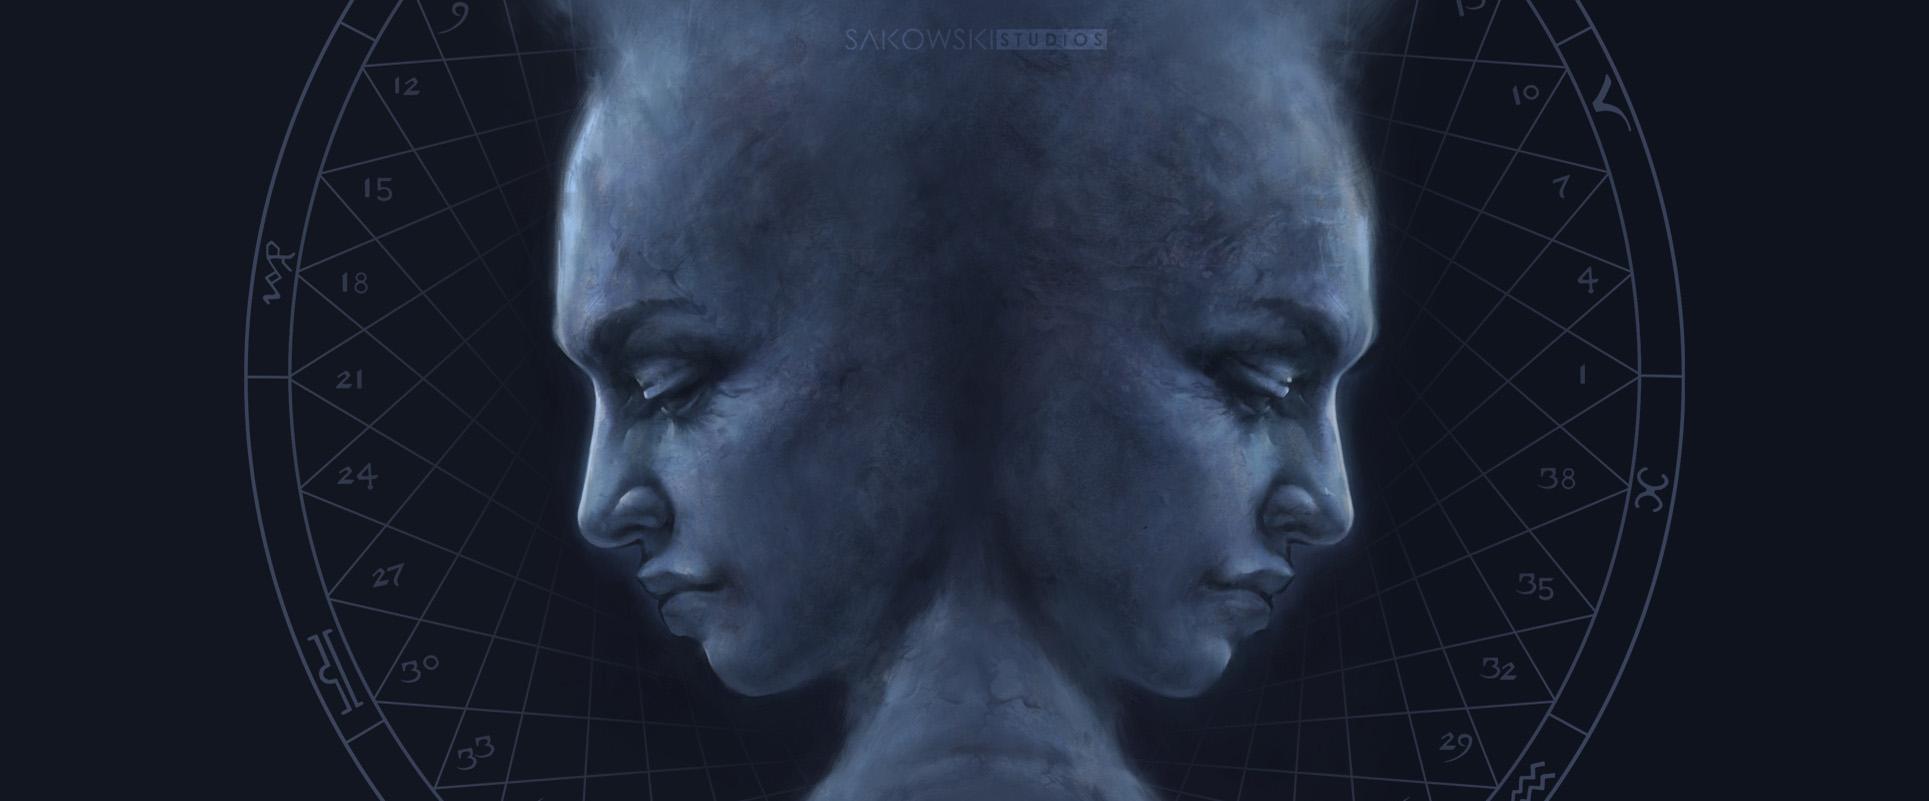 New Way Home - Album Design